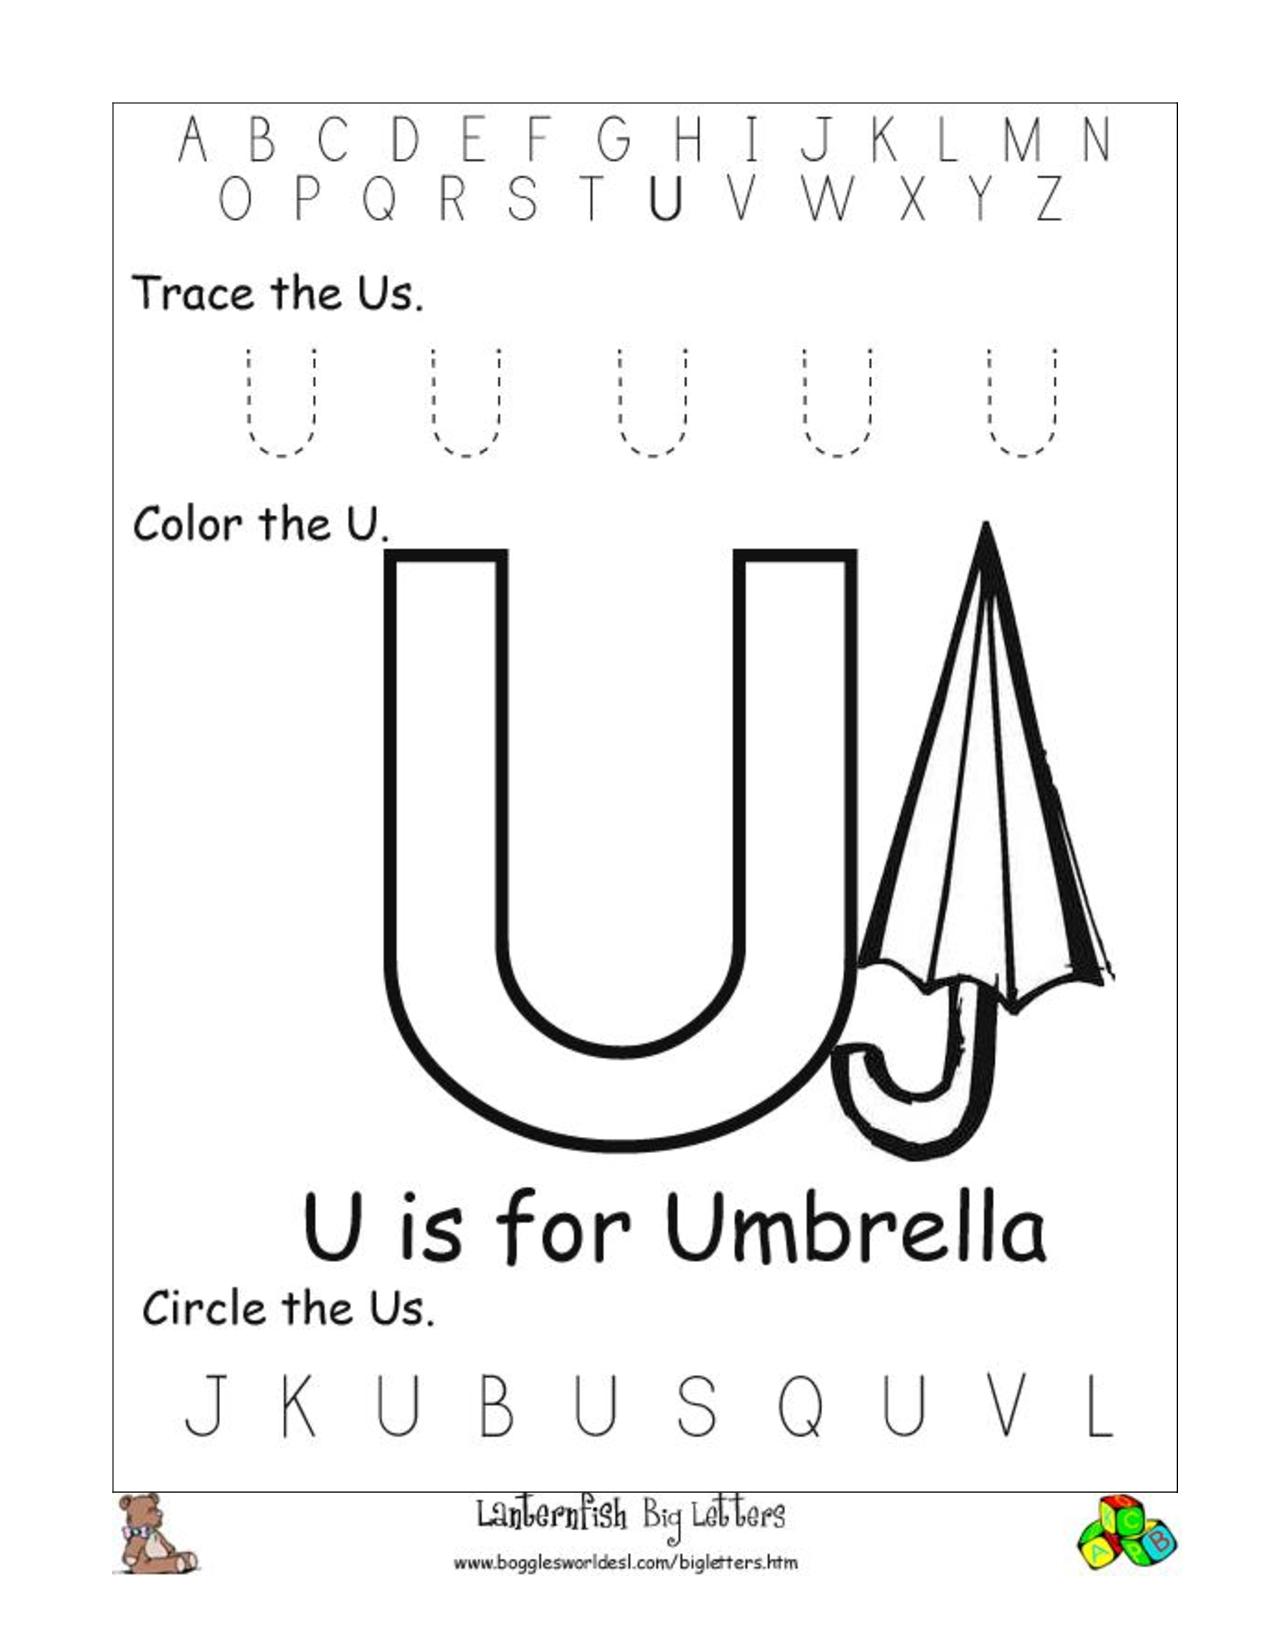 Alphabet Worksheets For Preschoolers | Alphabet Worksheet throughout Letter U Worksheets For First Grade